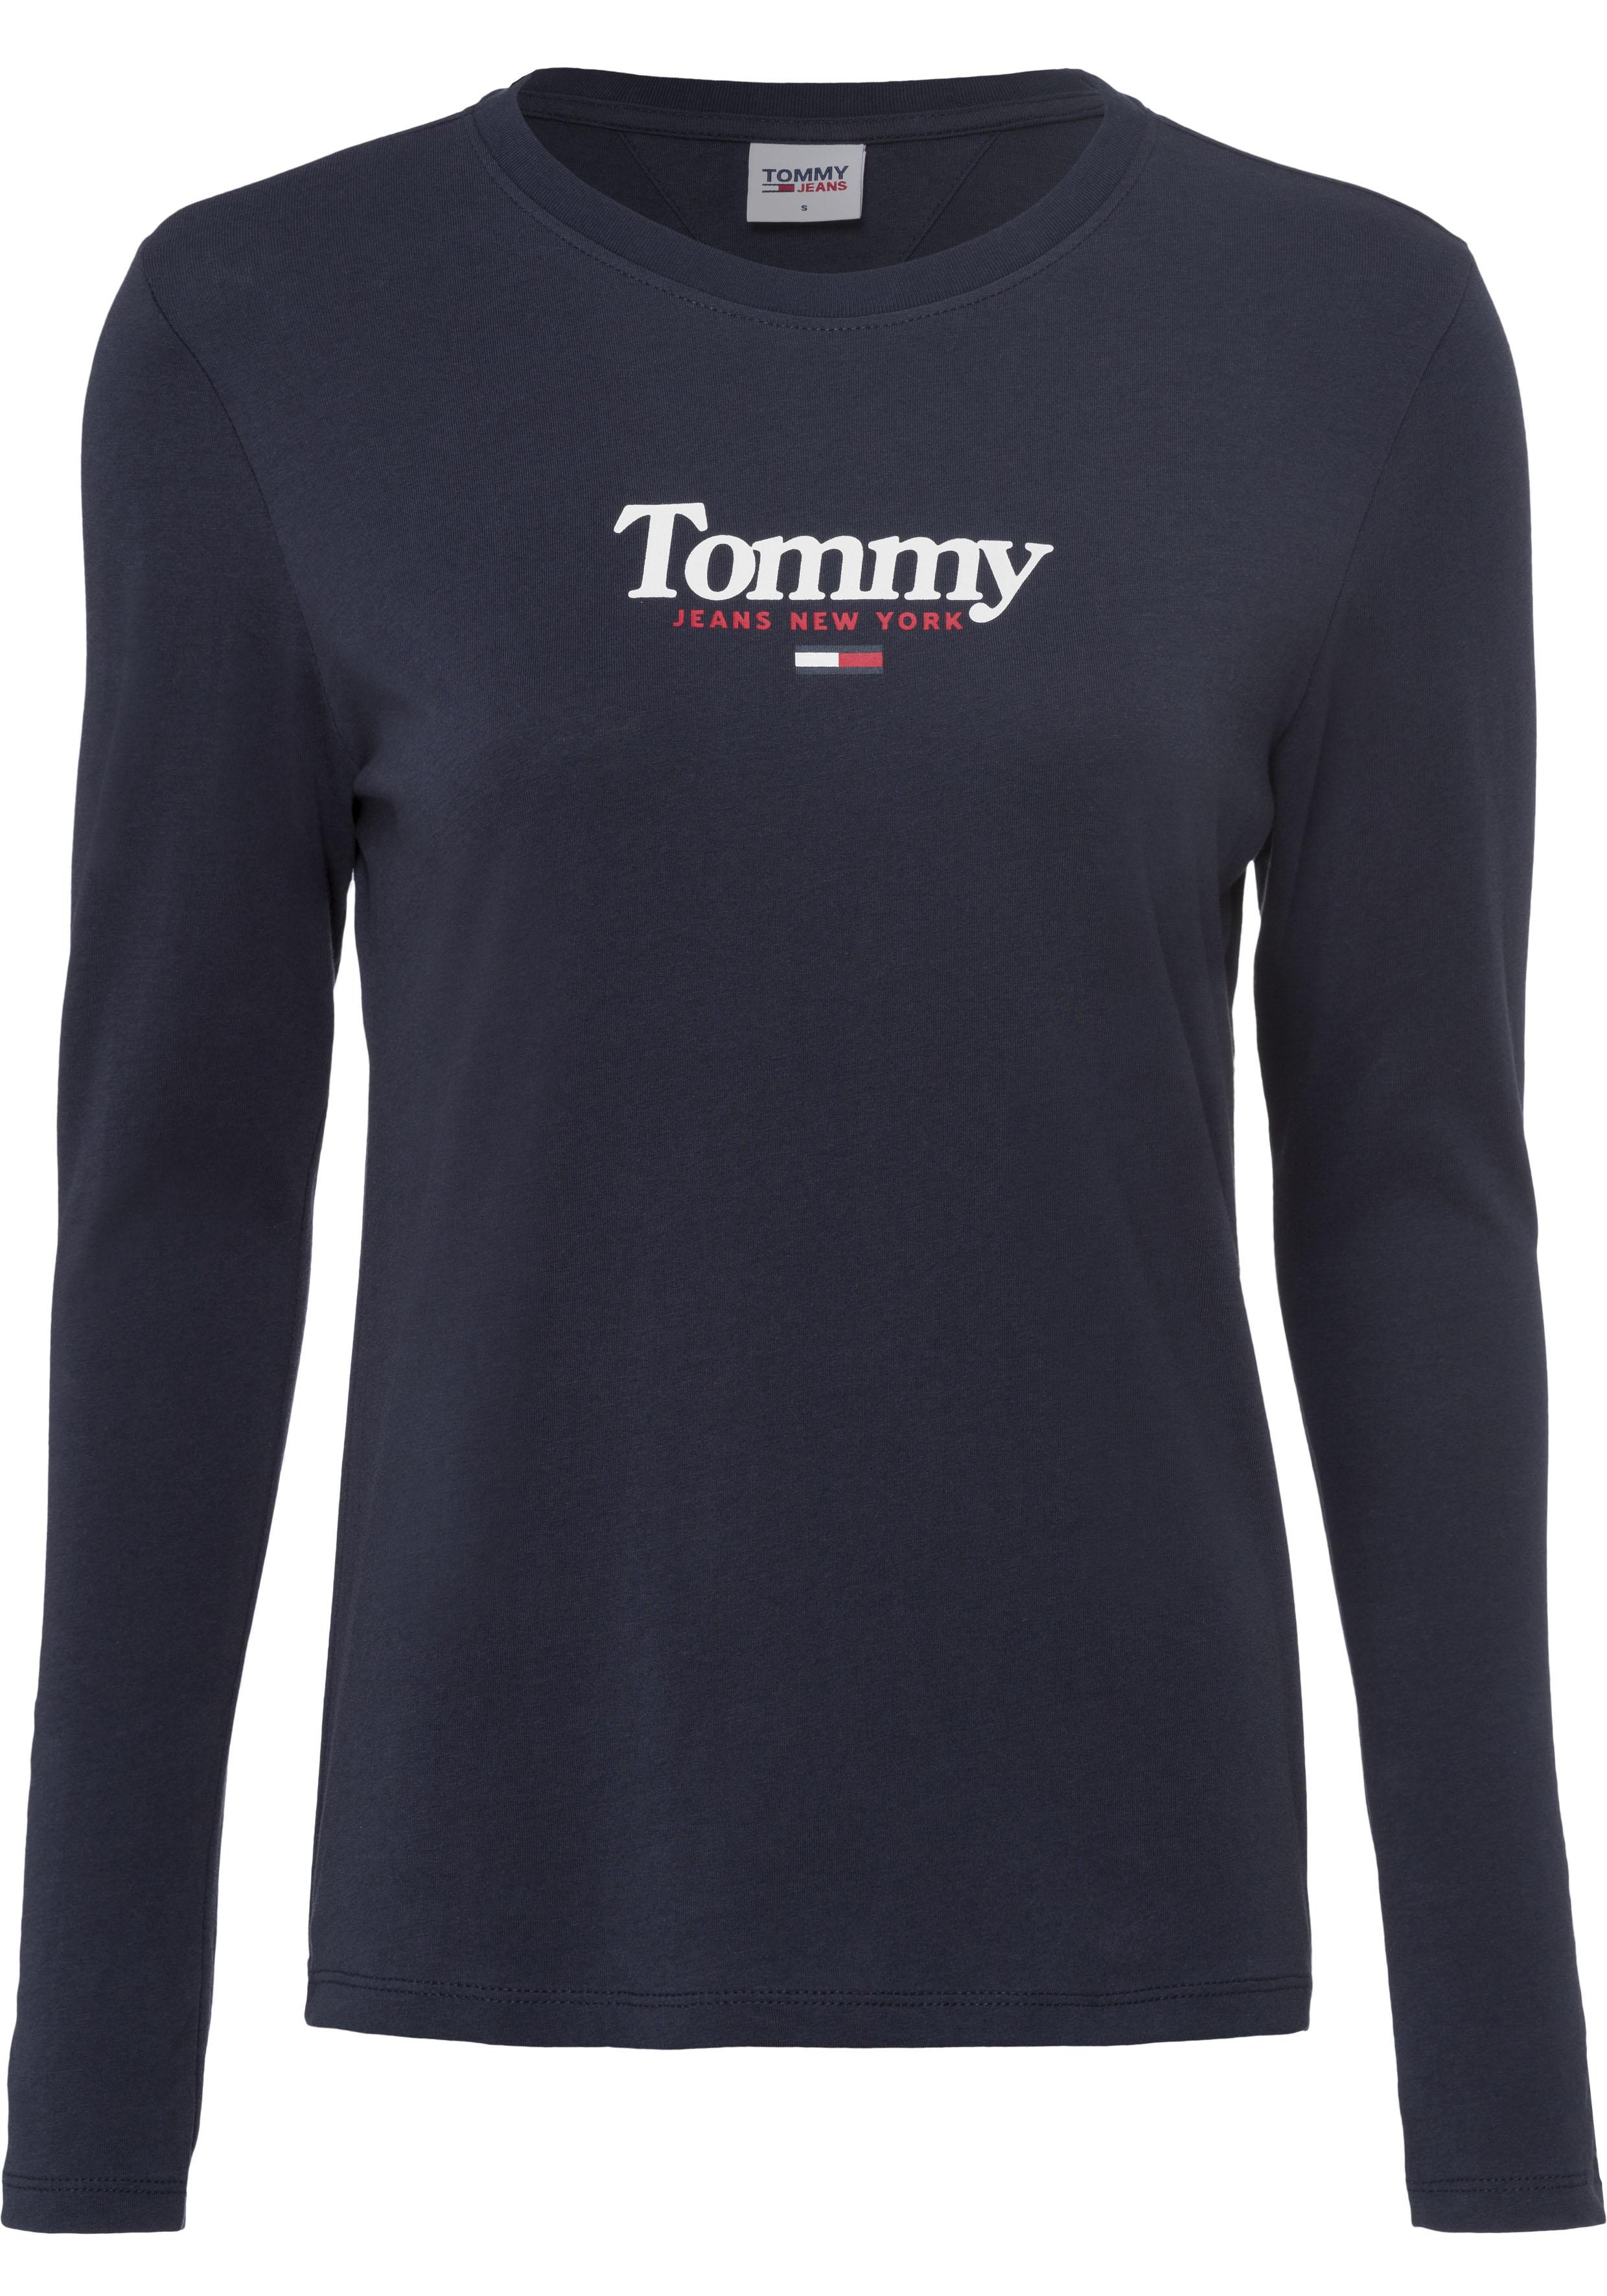 tommy jeans -  Langarmshirt